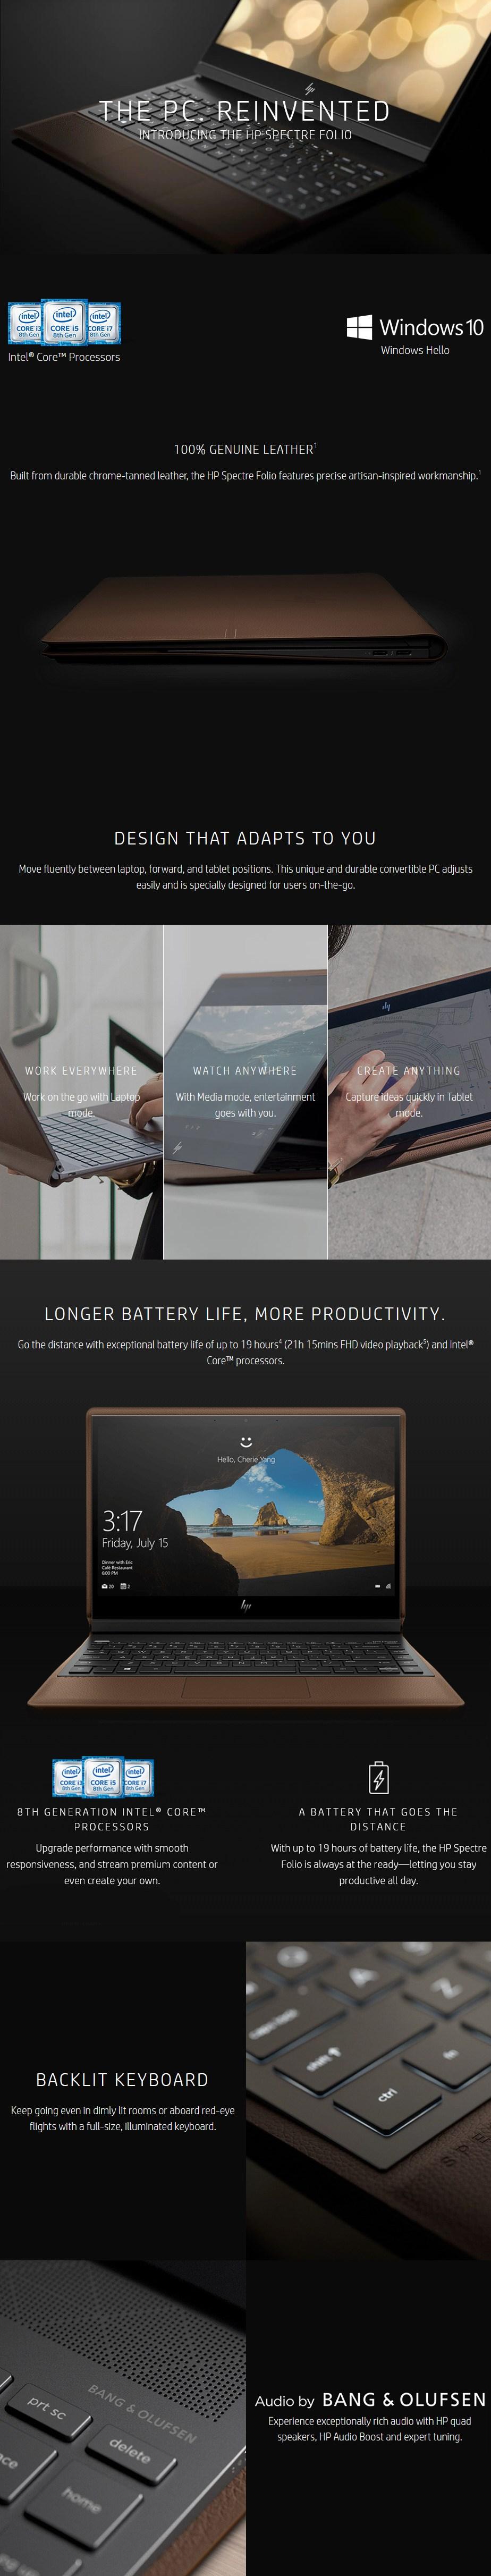 "HP Spectre Folio 13.3"" Tablet i7-8500Y 16GB 512GB Win10 Home - Desktop Overview 1"